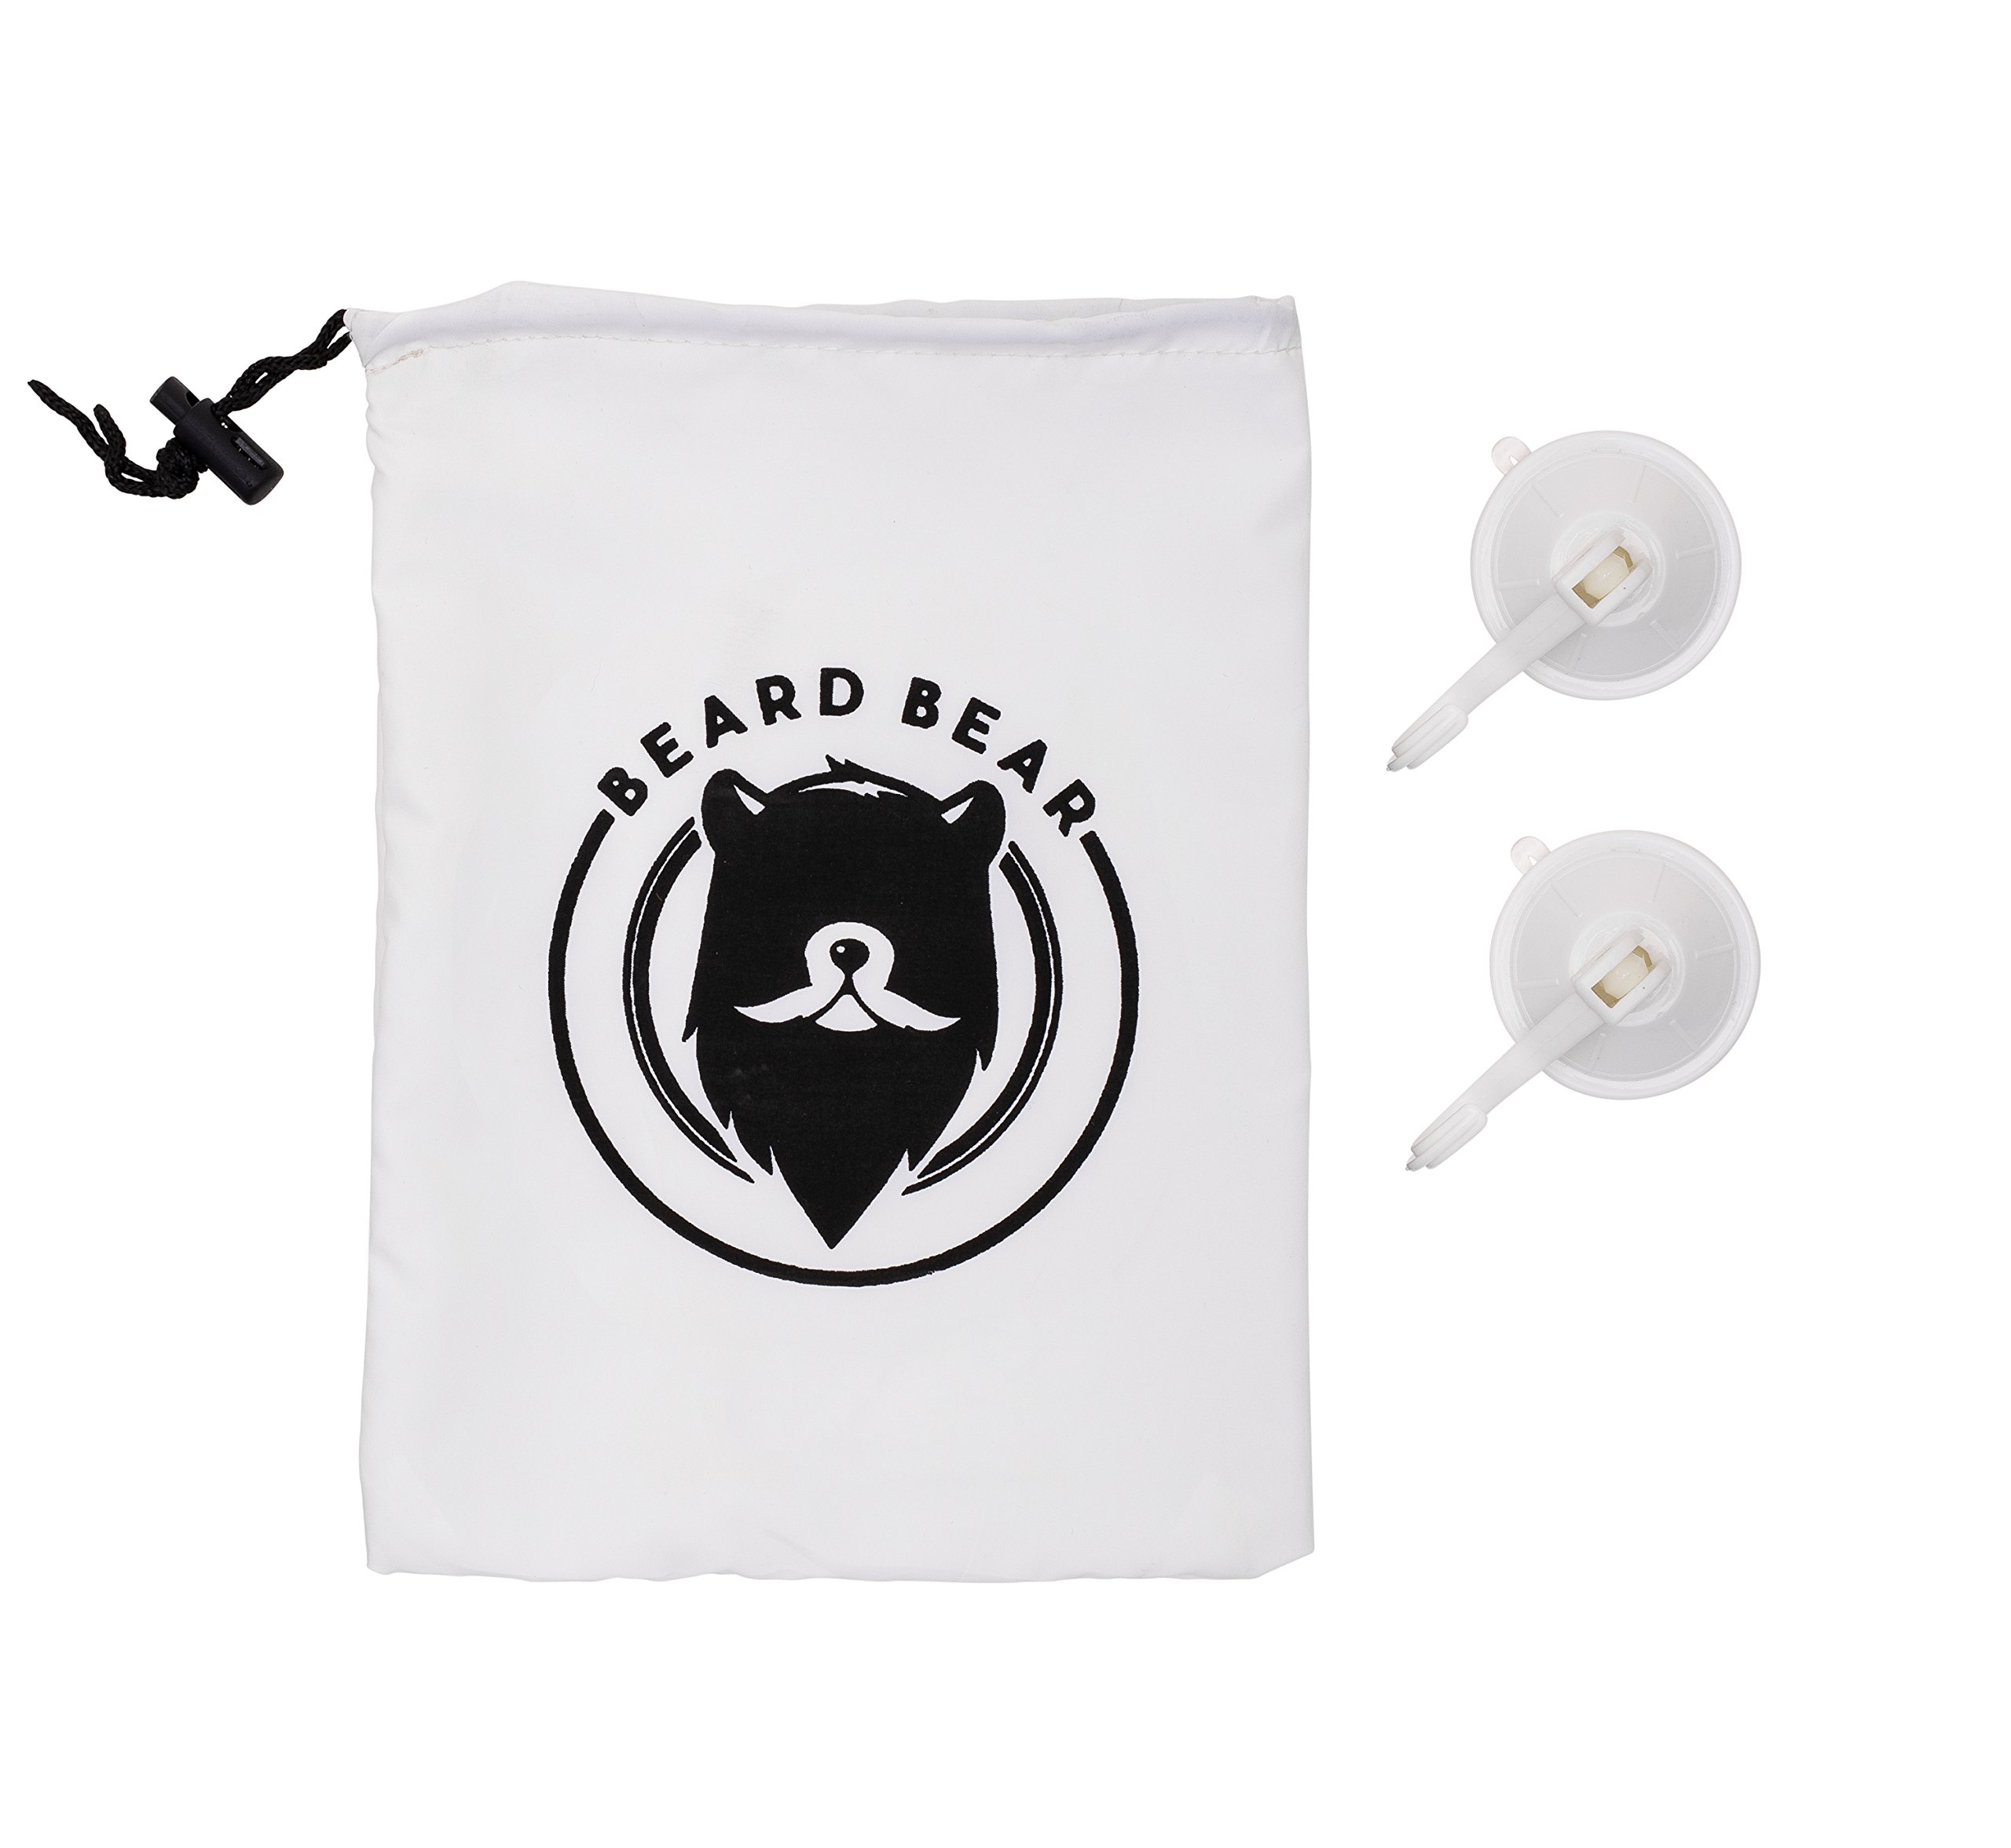 BEARD BEAR Beard Bib Apron - Premium Apron for Trimming & Cutting Your Beard Without Mess - Men's Shaving Grooming Catcher Cape - Great Gift Idea for Men, White by Beard Bear (Image #2)